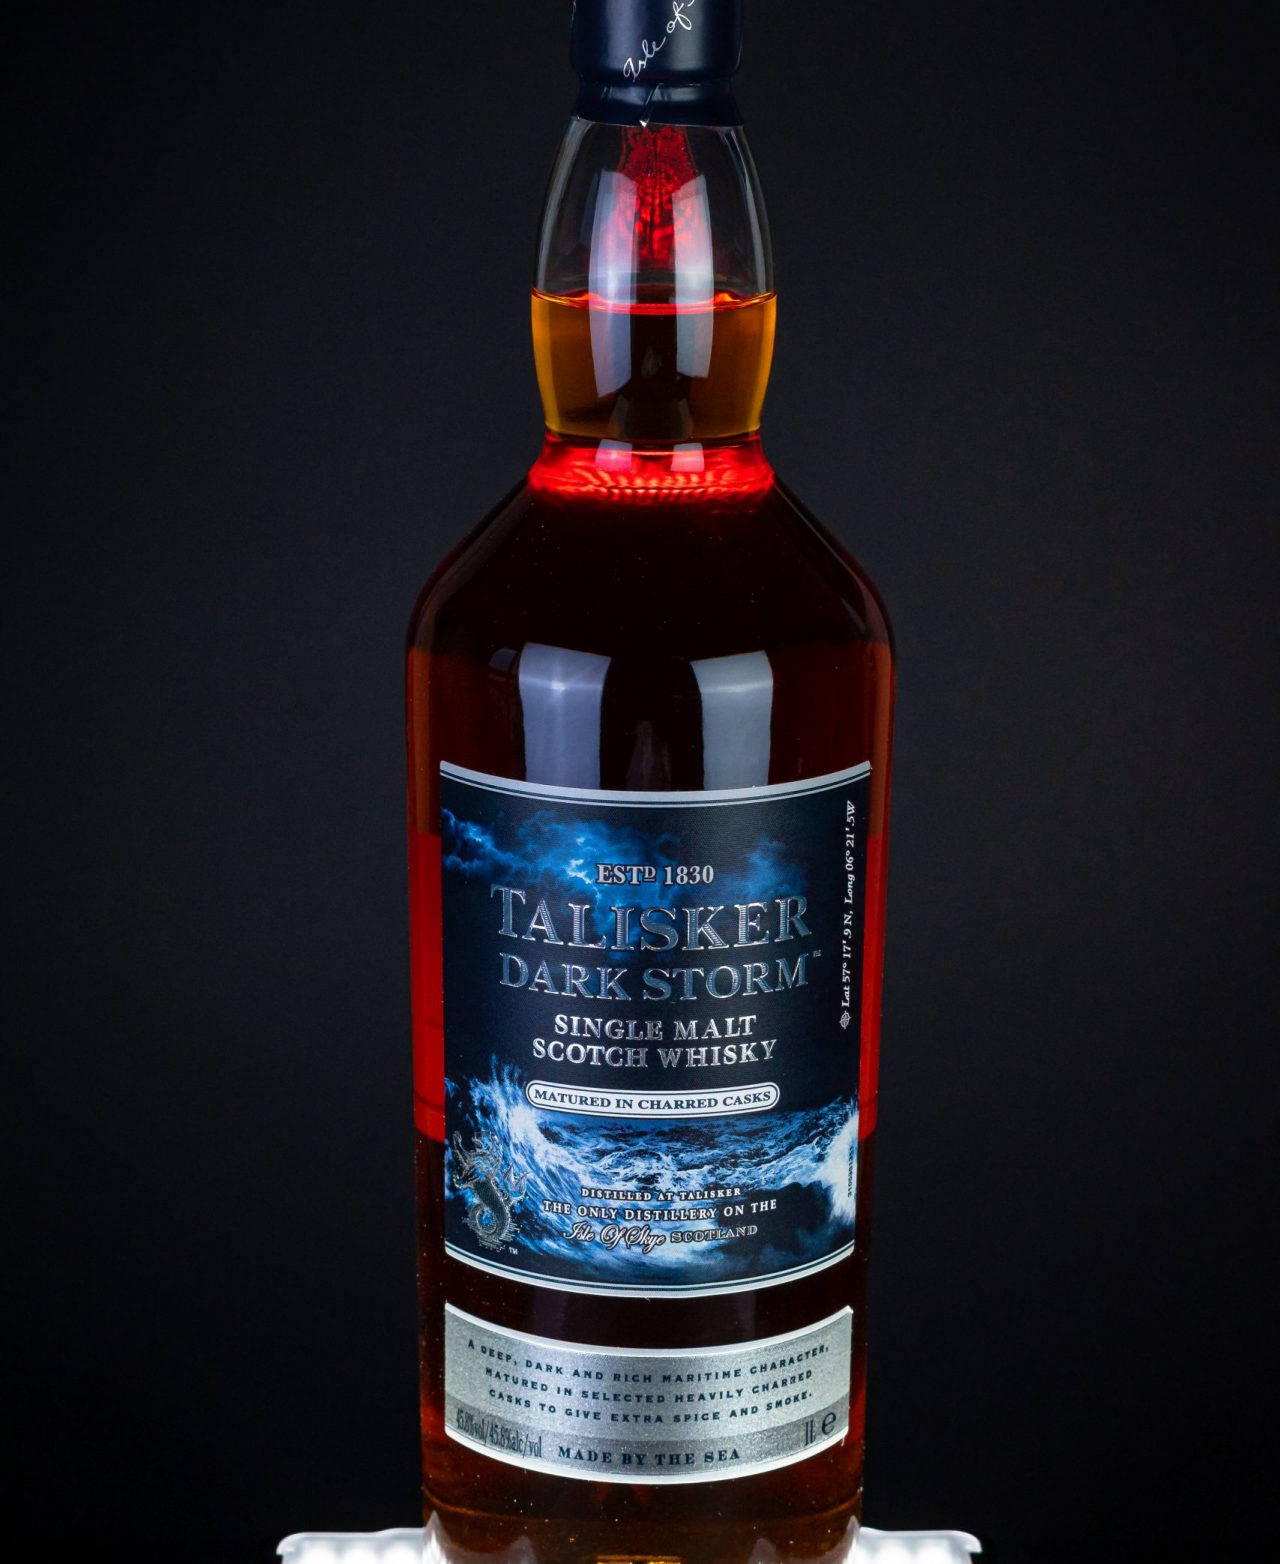 Talisker Dark Storm 5cl